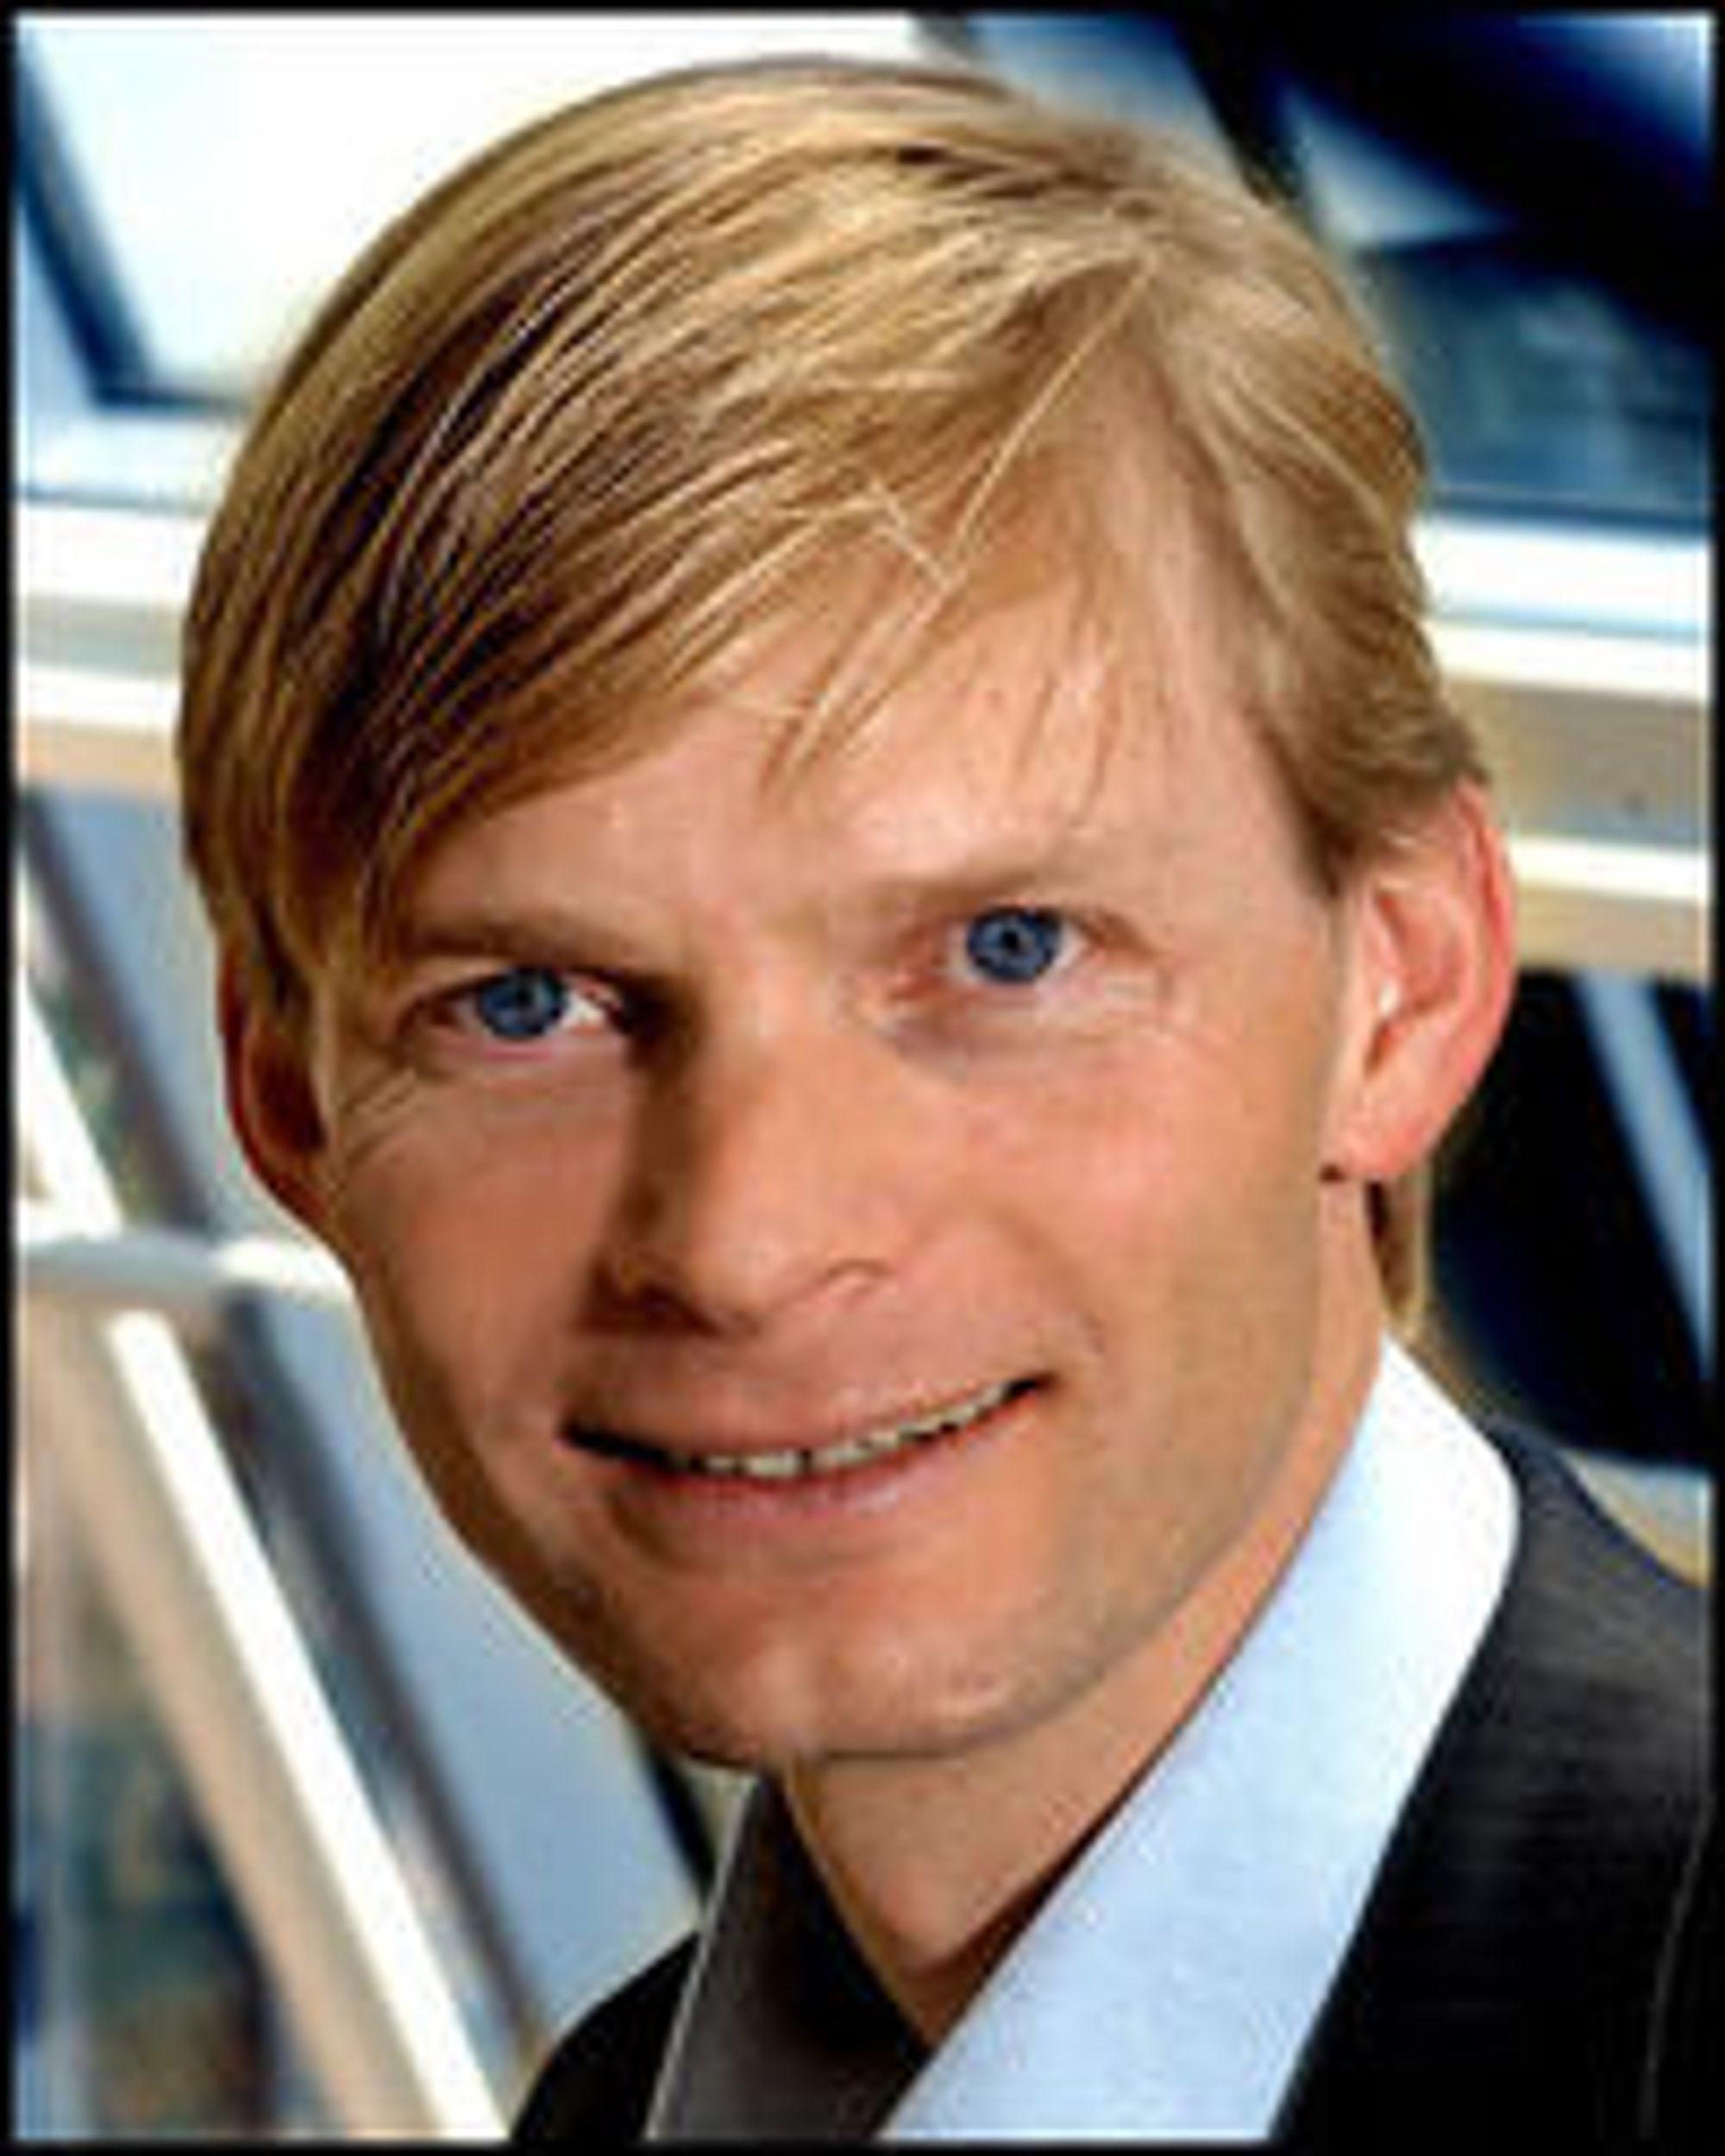 Beklager det inntrufne: Øyvind Husby er direktør for samfunnskontakt i Get.